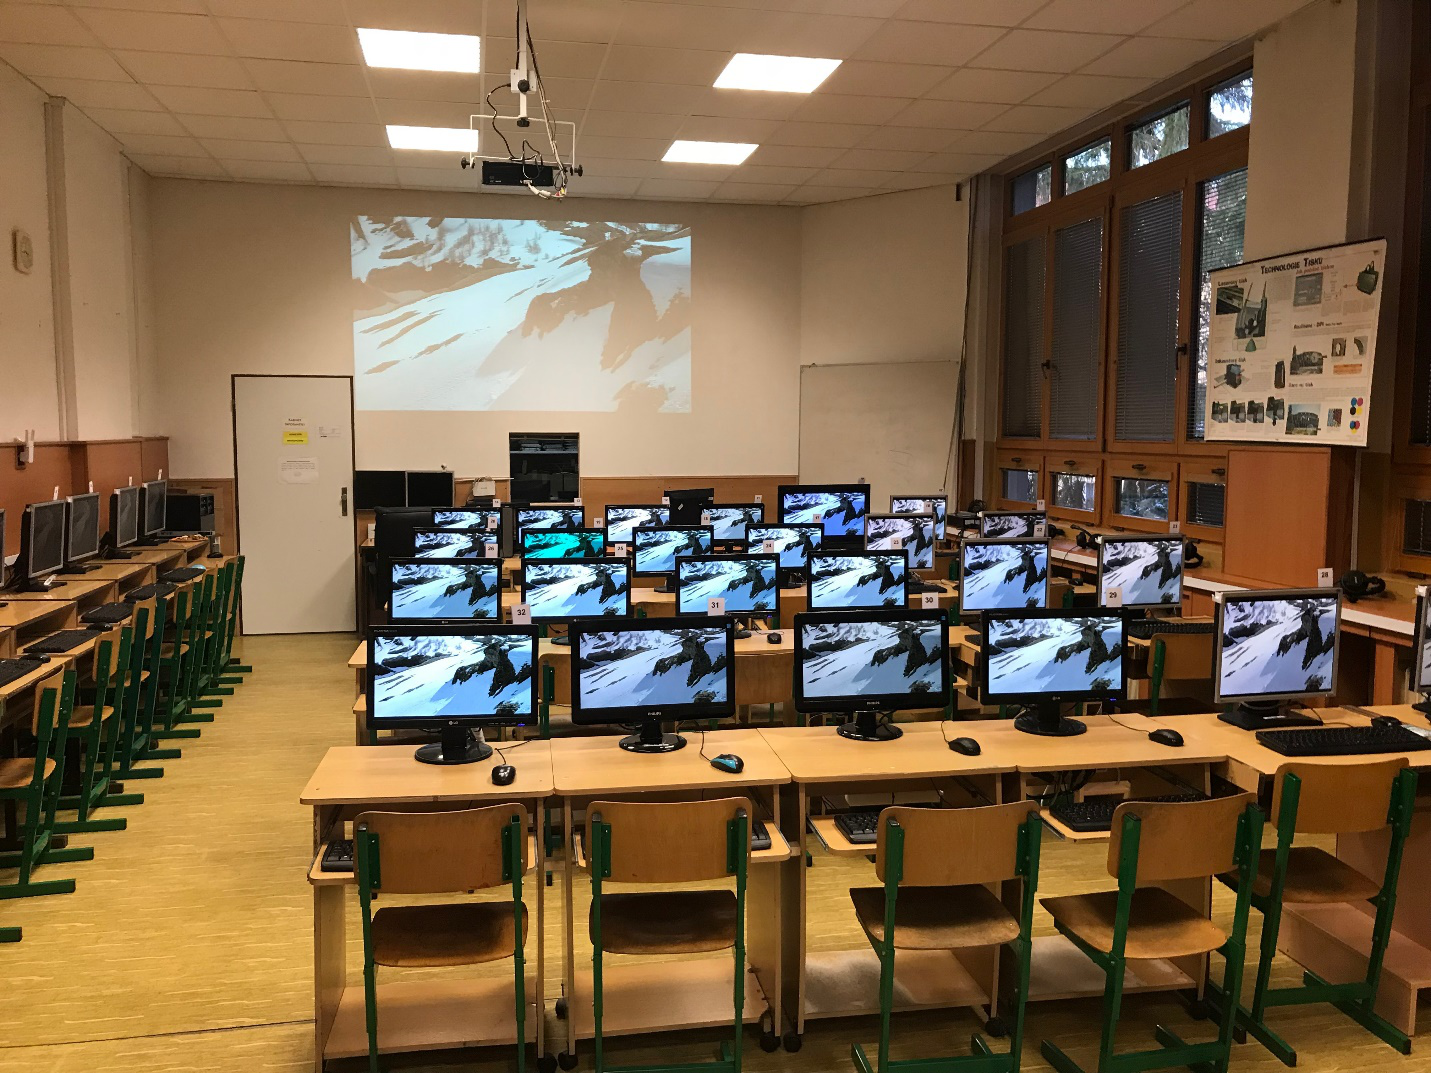 Brigadniku-Praha-Primary-school-in-Slovakia4.png